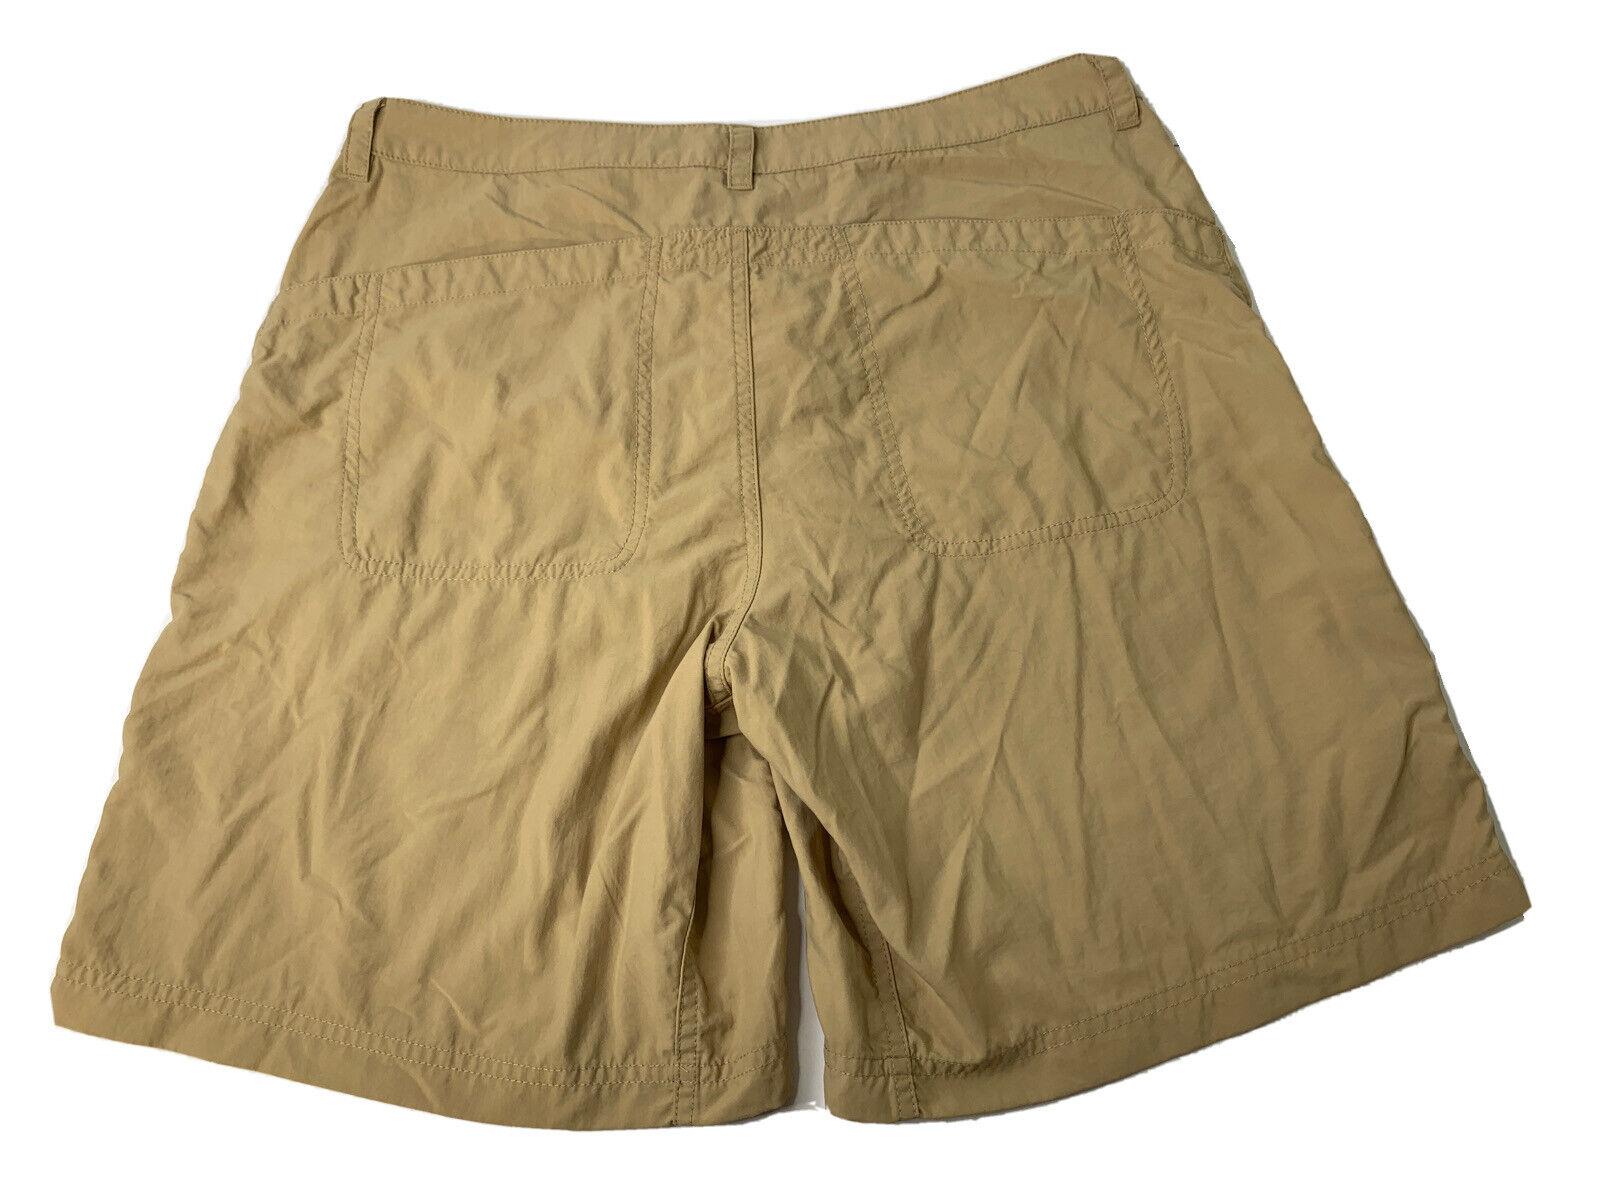 Mountain Hardwear Womens 10 Medium Tan Brown Lightweight Outdoor Nylon Short EUC